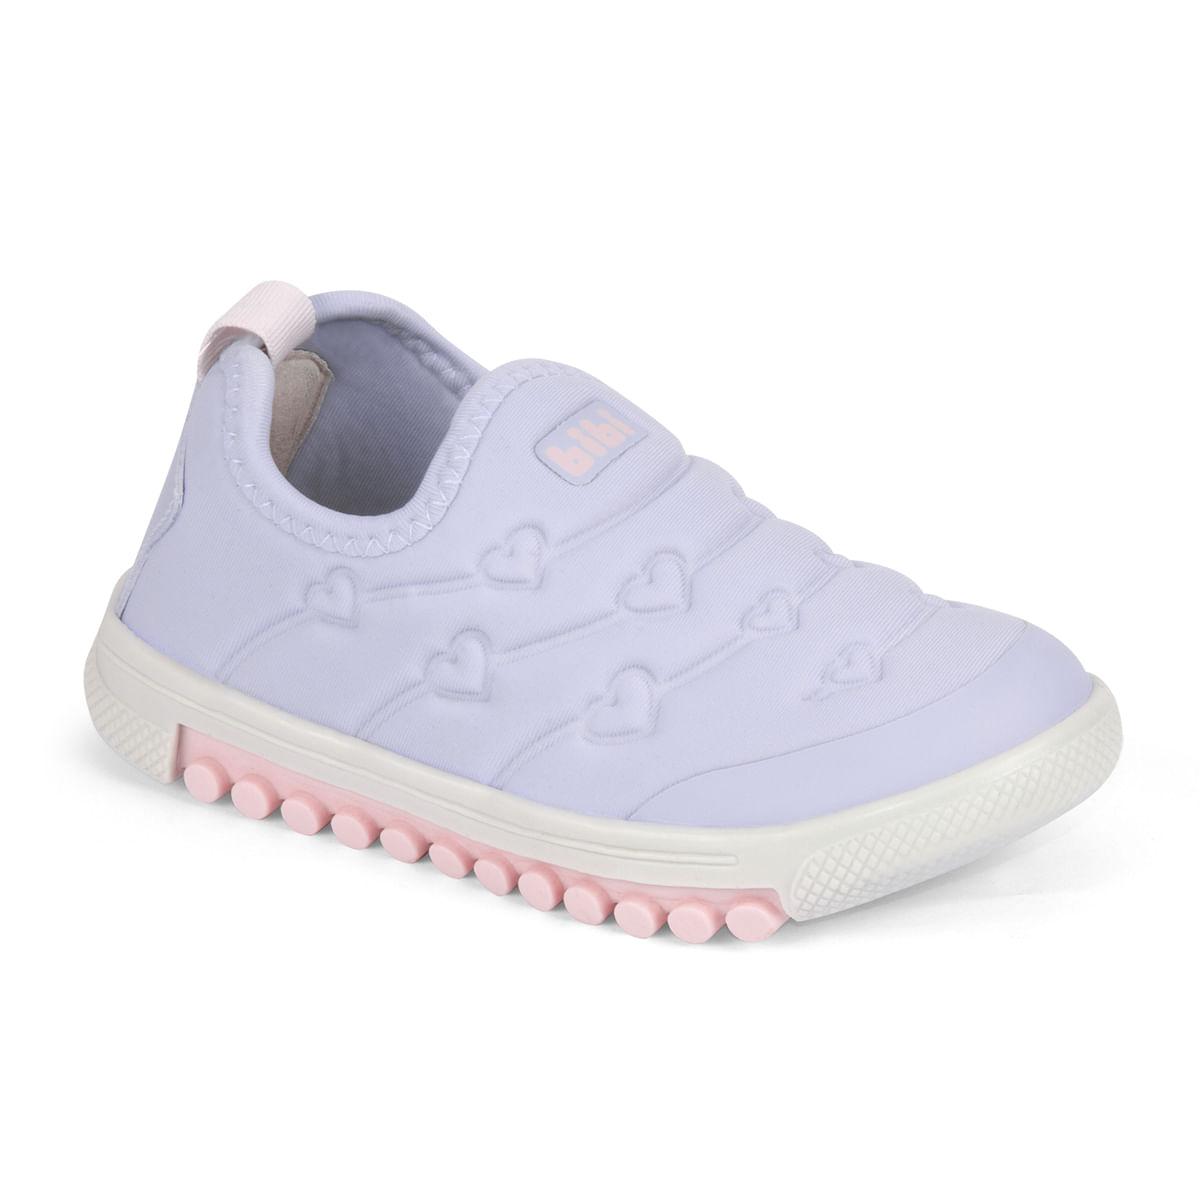 4031ef230a Tênis Infantil Feminino Bibi Lilás Roller New 679467 - Bibi Calçados